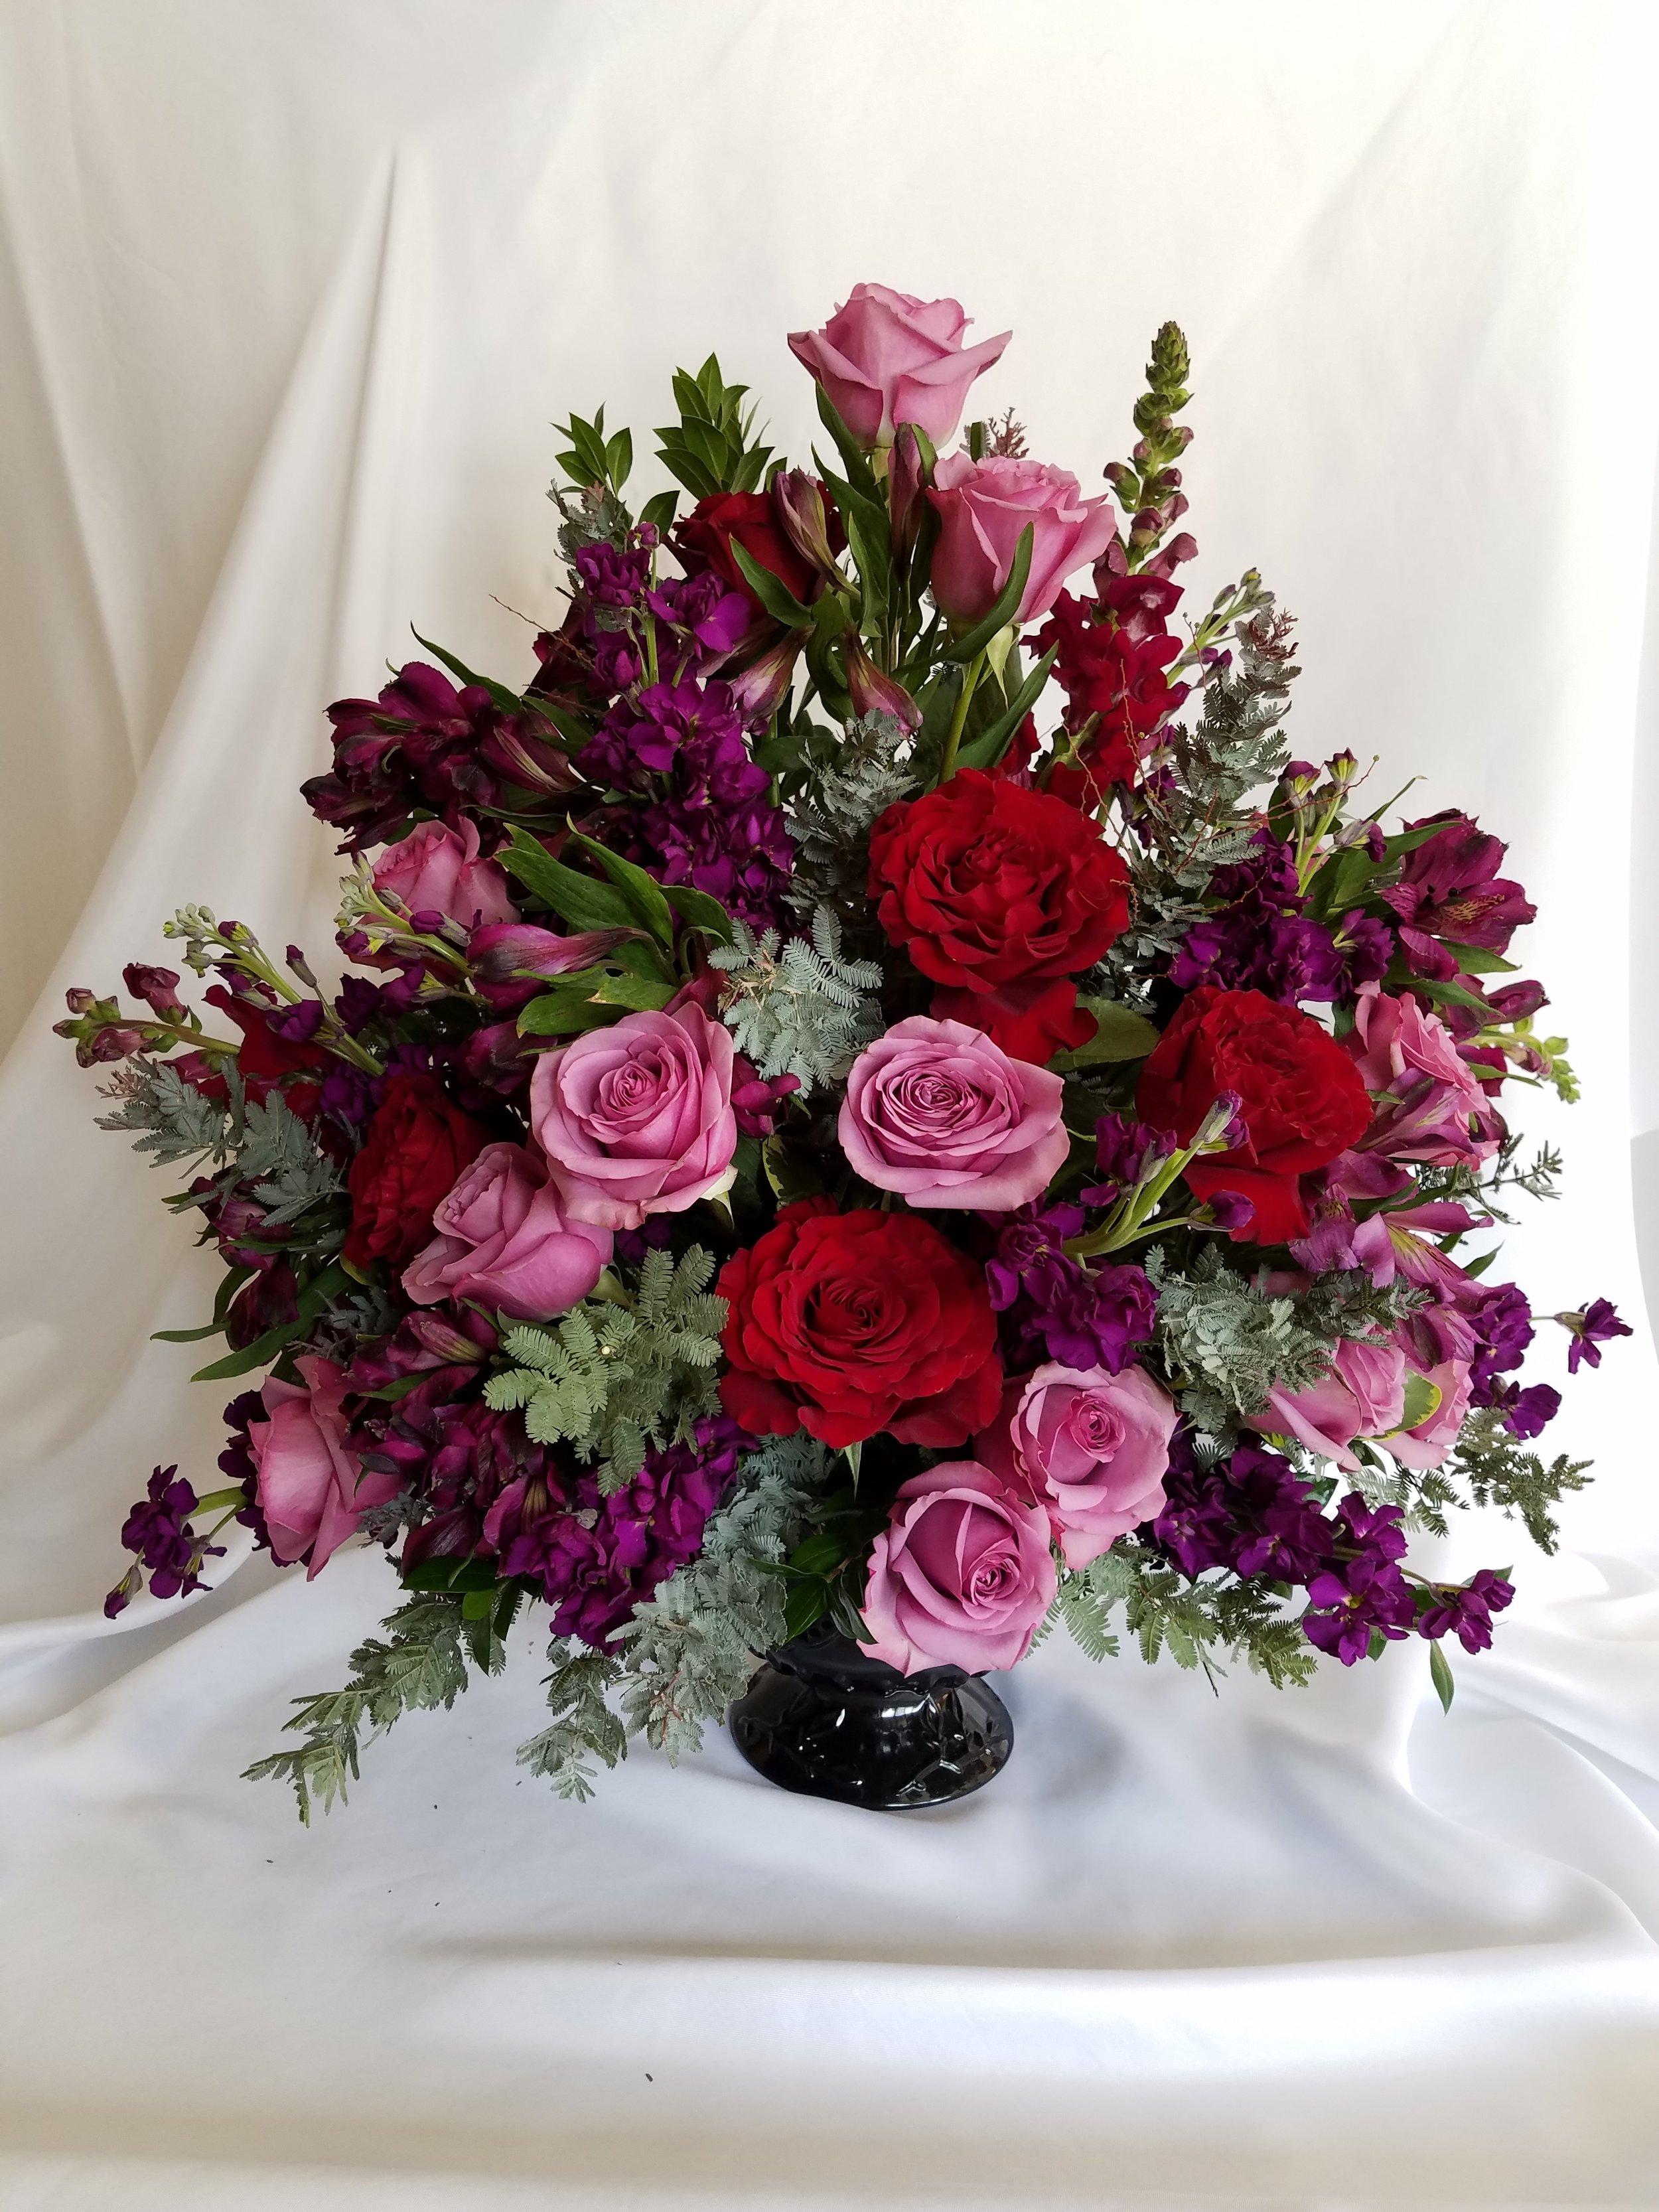 Moody red, pink purple sympathy arrangement